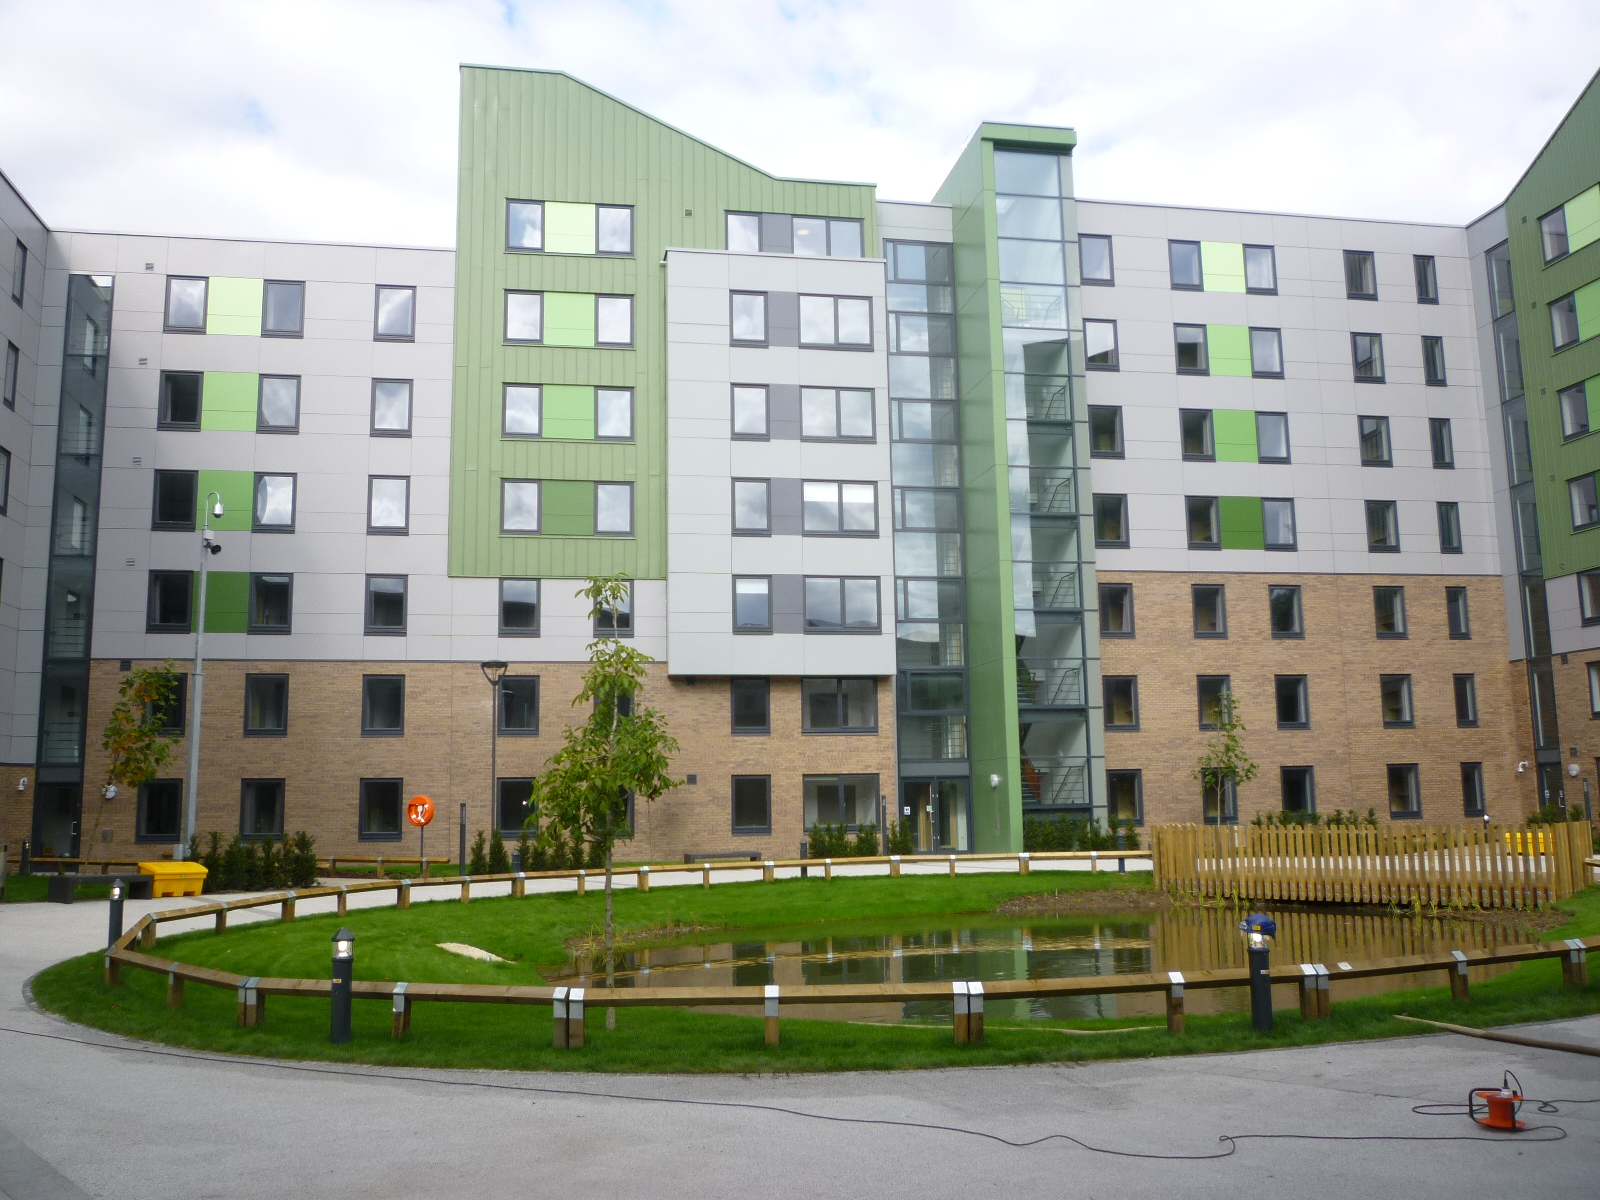 Bradford – Listerhills Student Village (2011)